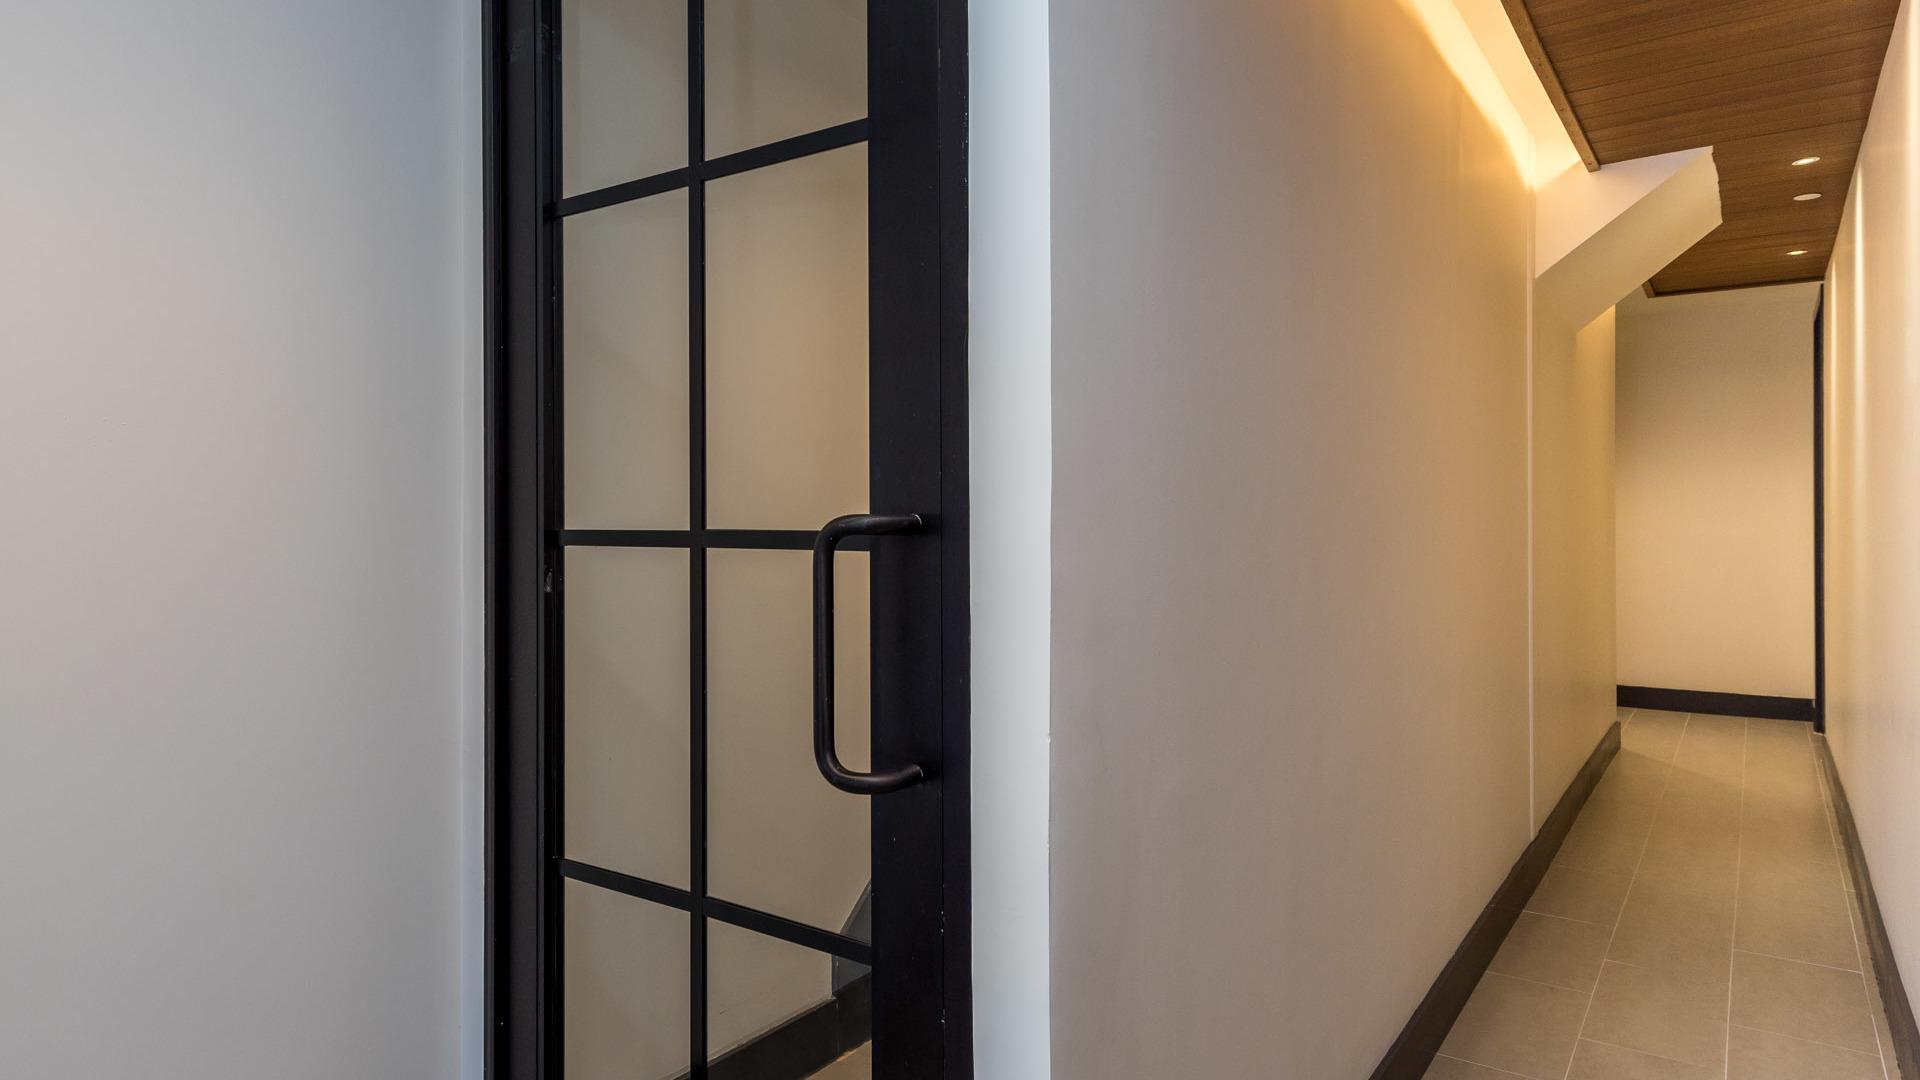 161 winthrop street interior first floor 1